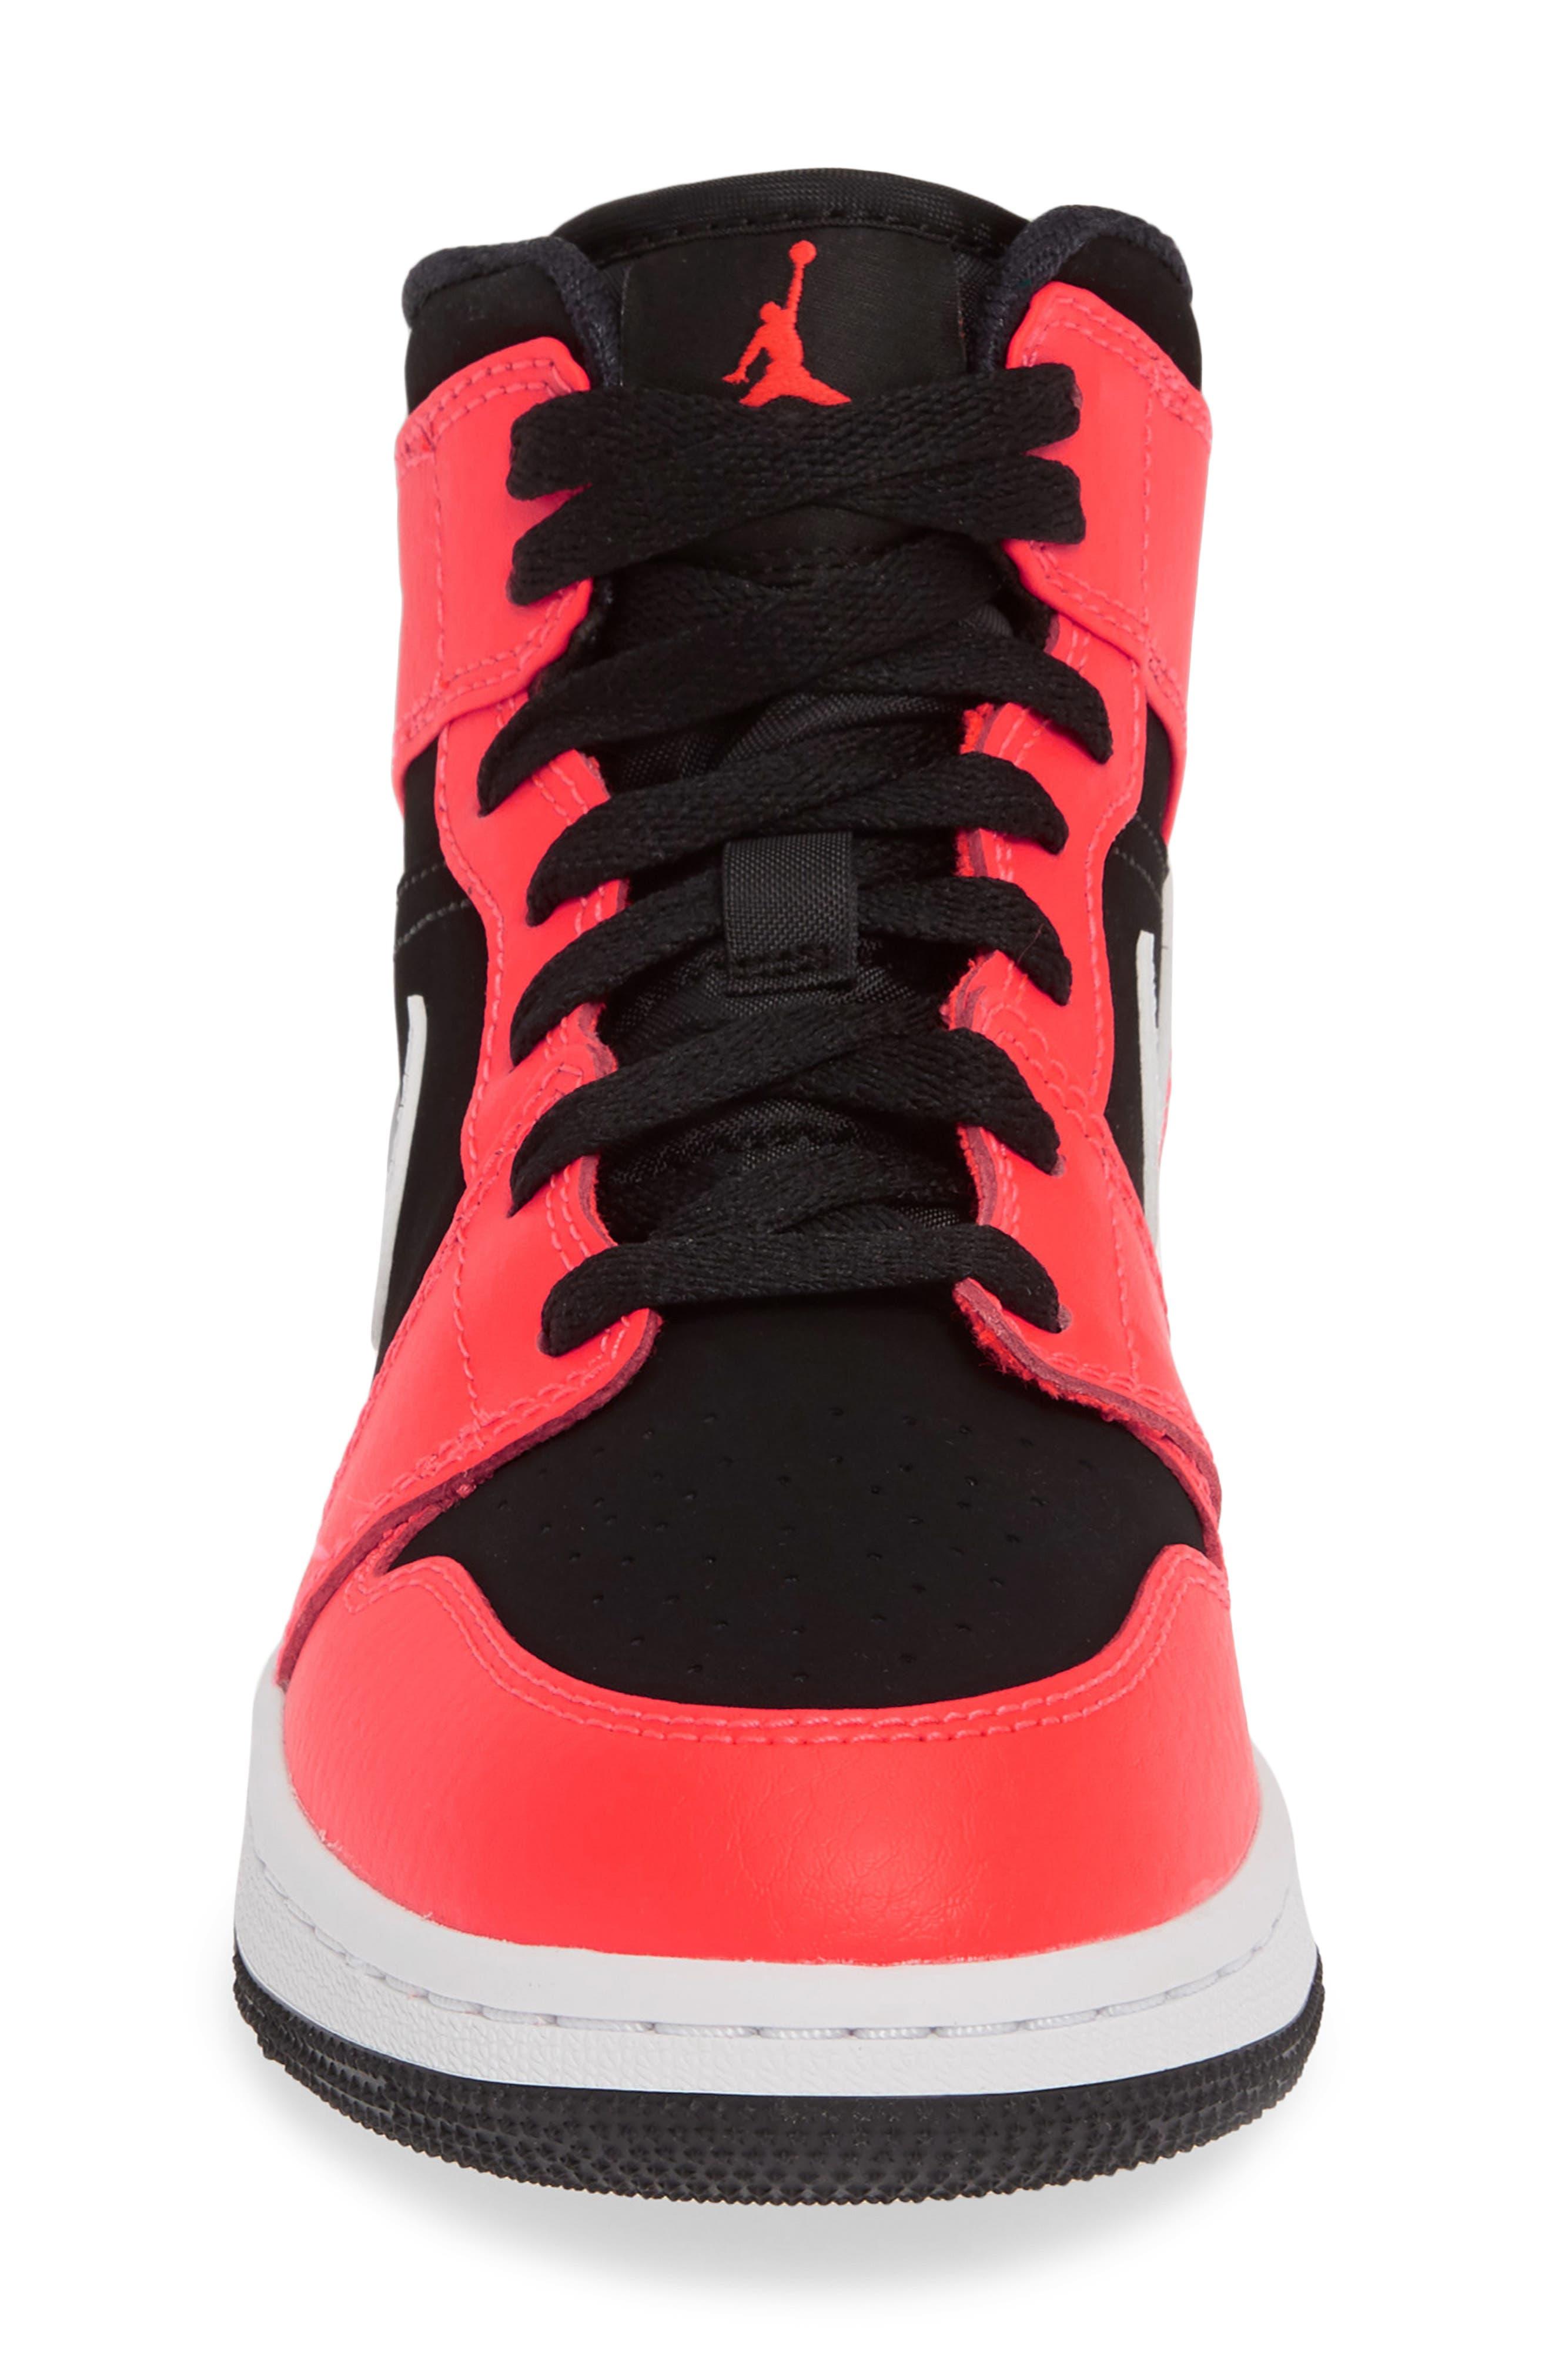 JORDAN, Nike 'Air Jordan 1 Mid' Sneaker, Alternate thumbnail 4, color, BLACK/ INFRARED 23-WHITE